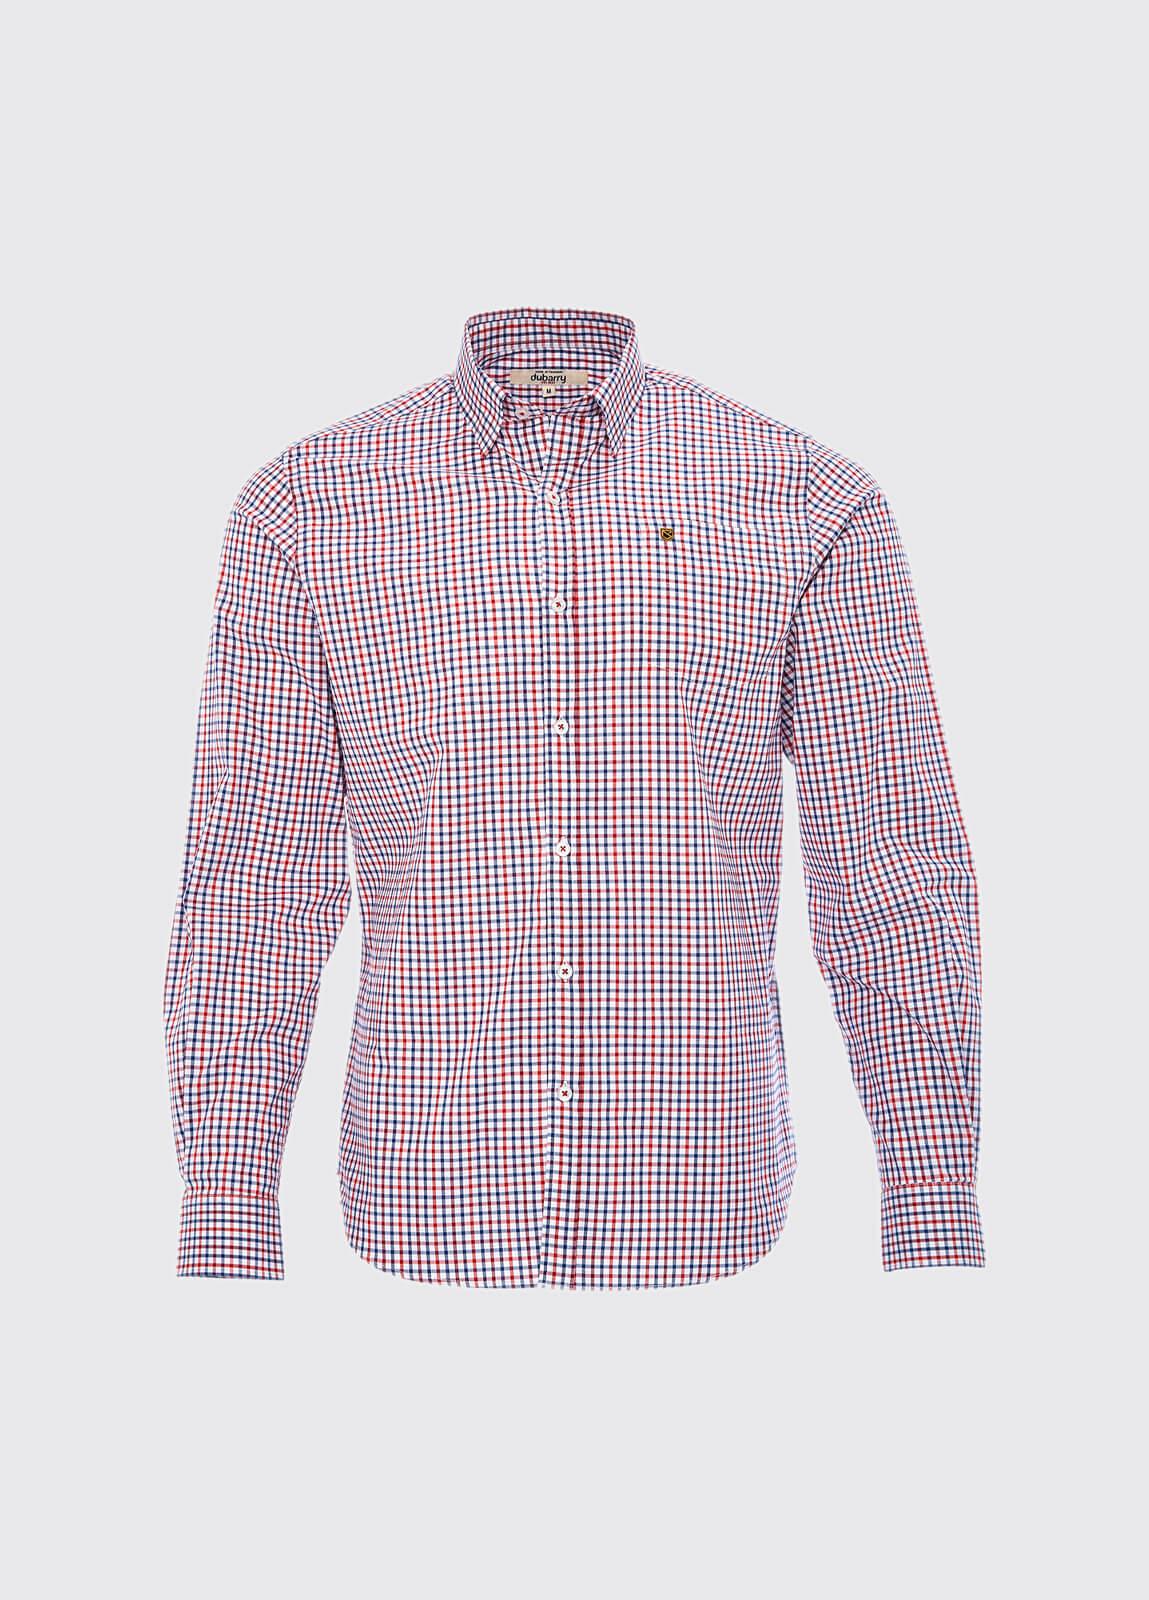 Ballincollig shirt - Saffron Multi